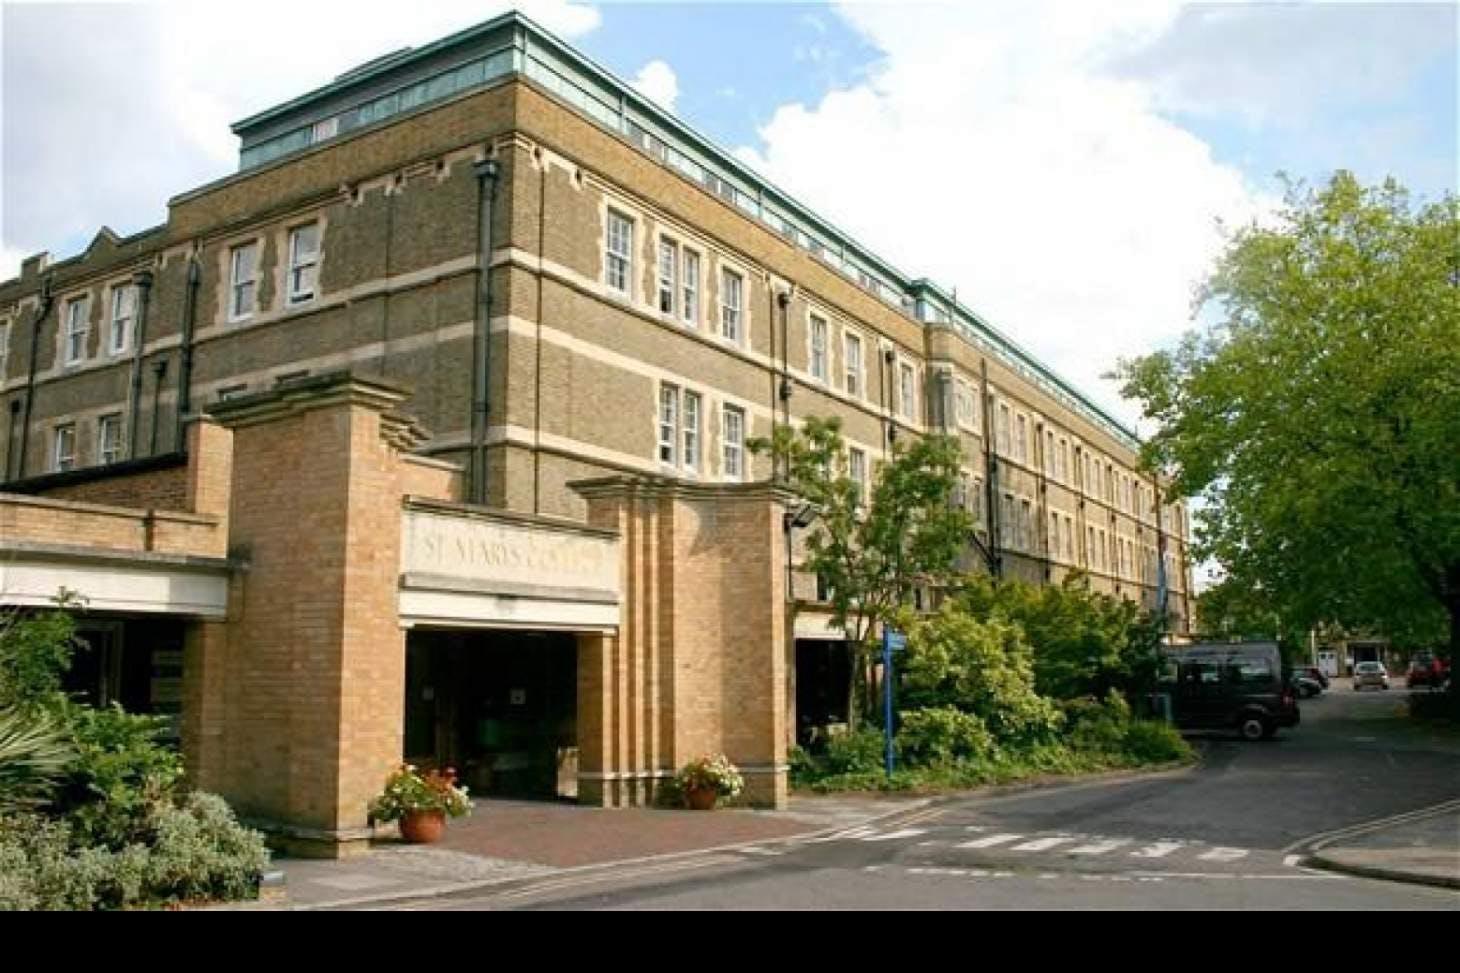 St Mary's University (Teddington Lock) Full size | Grass cricket facilities